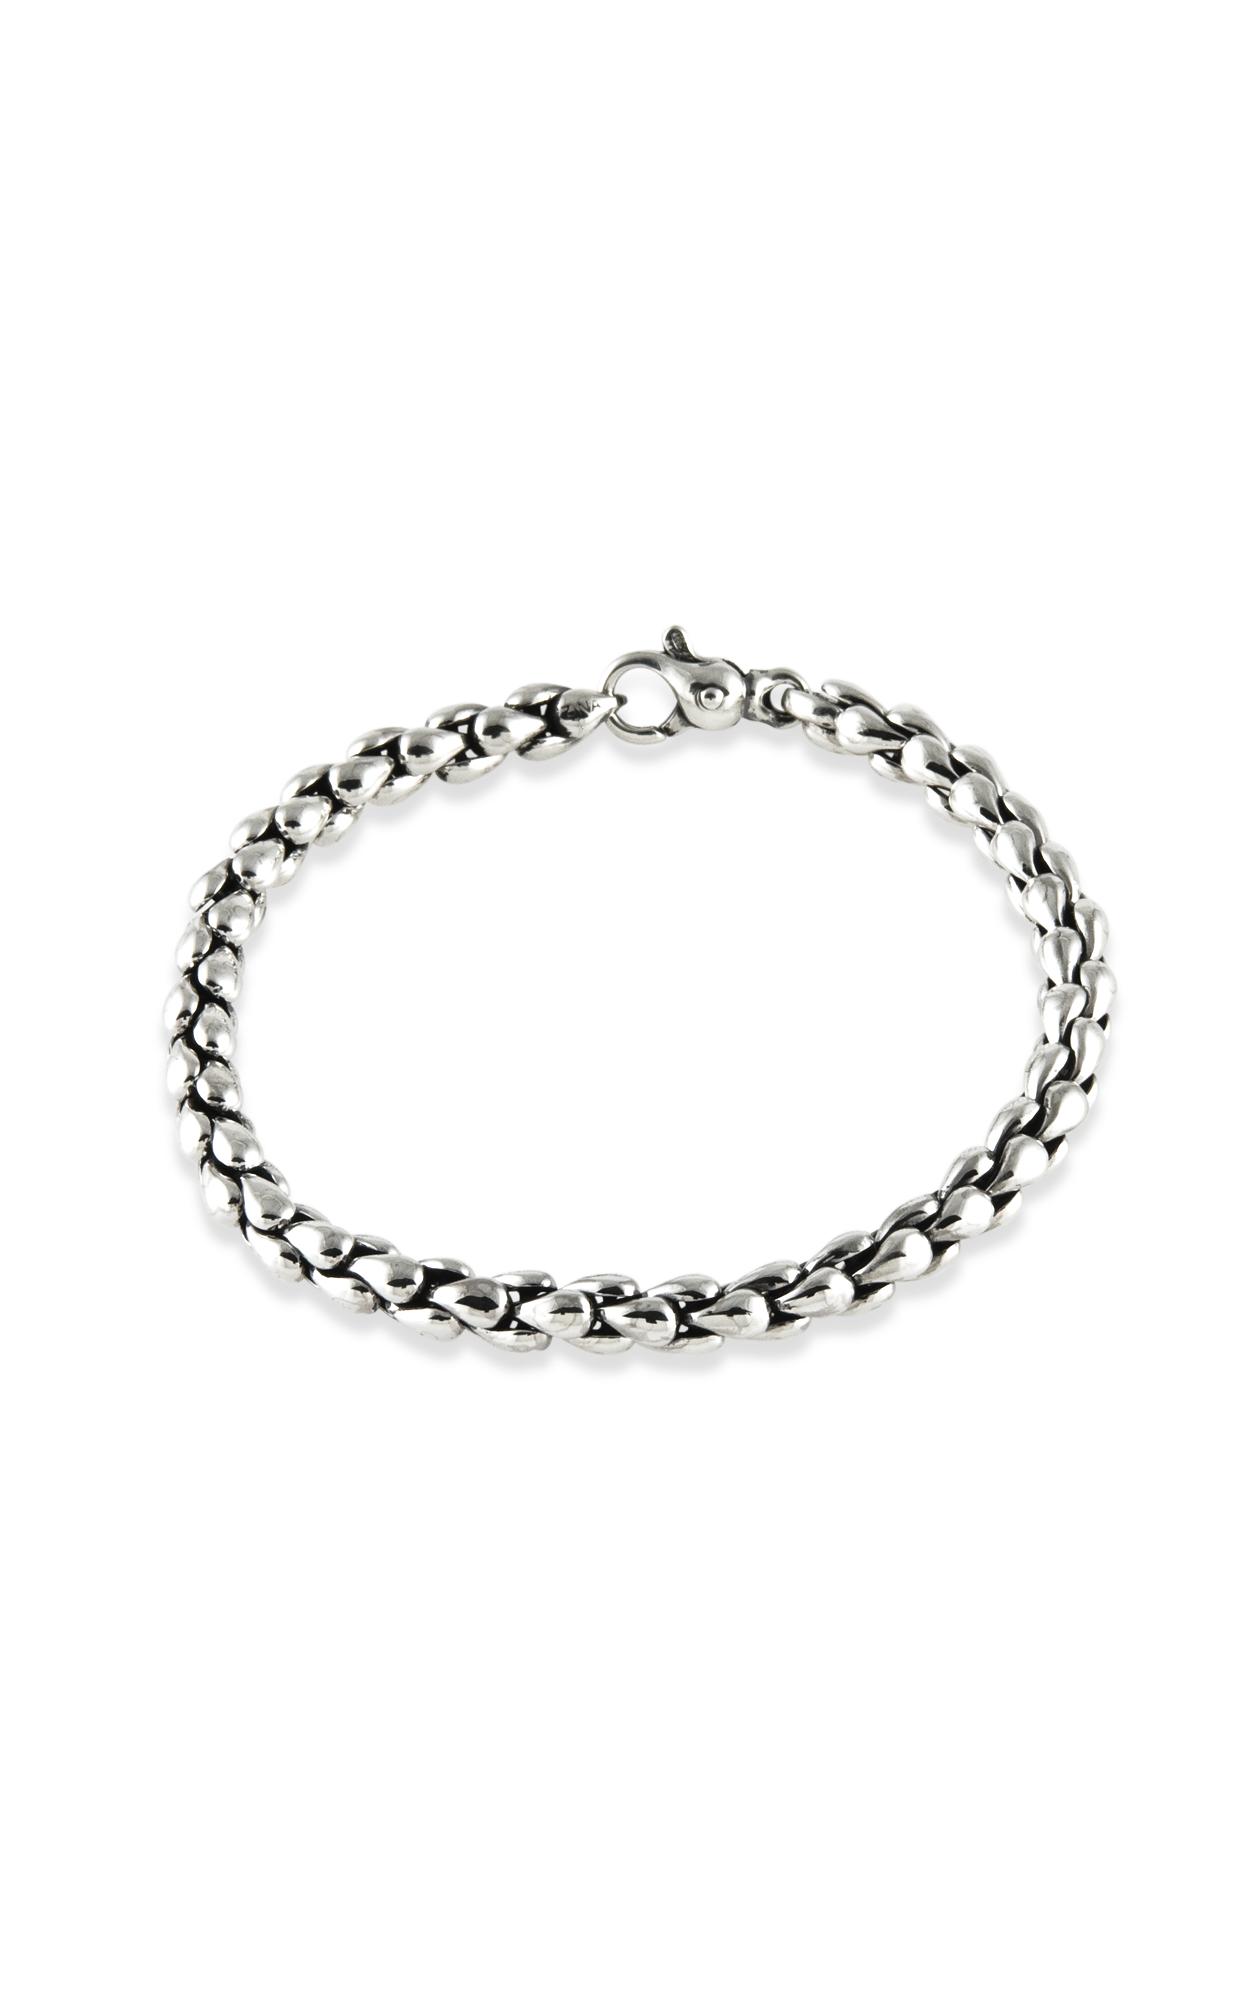 Zina Contemporary Bracelet A493-7S product image